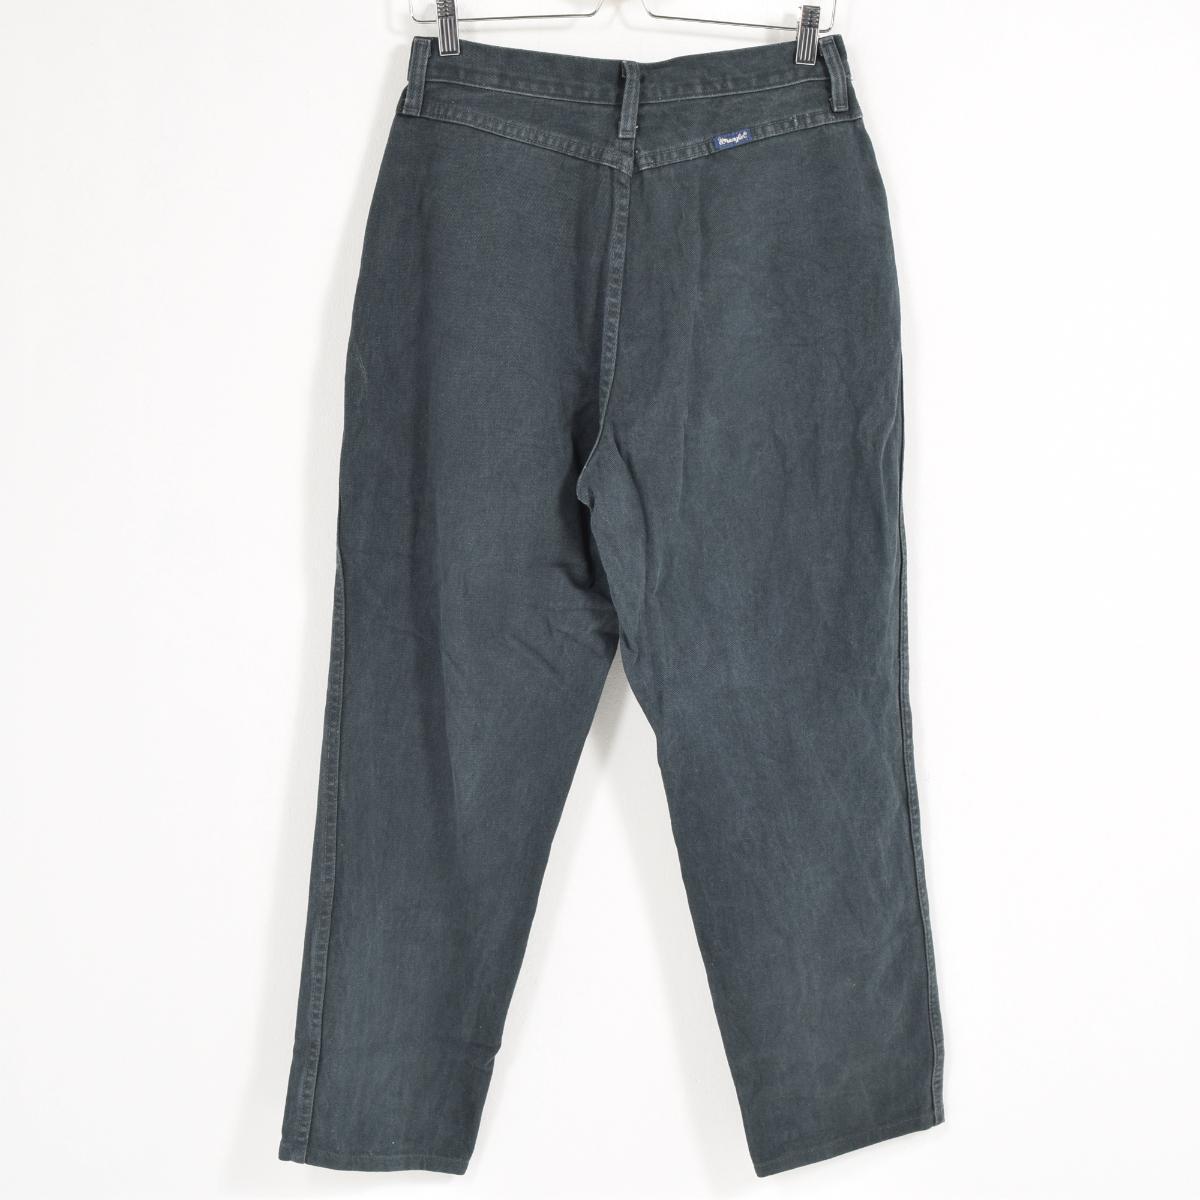 vintage clothing jam men w30 wad1705 made in wrangler wrangler jeans straight denim underwear. Black Bedroom Furniture Sets. Home Design Ideas